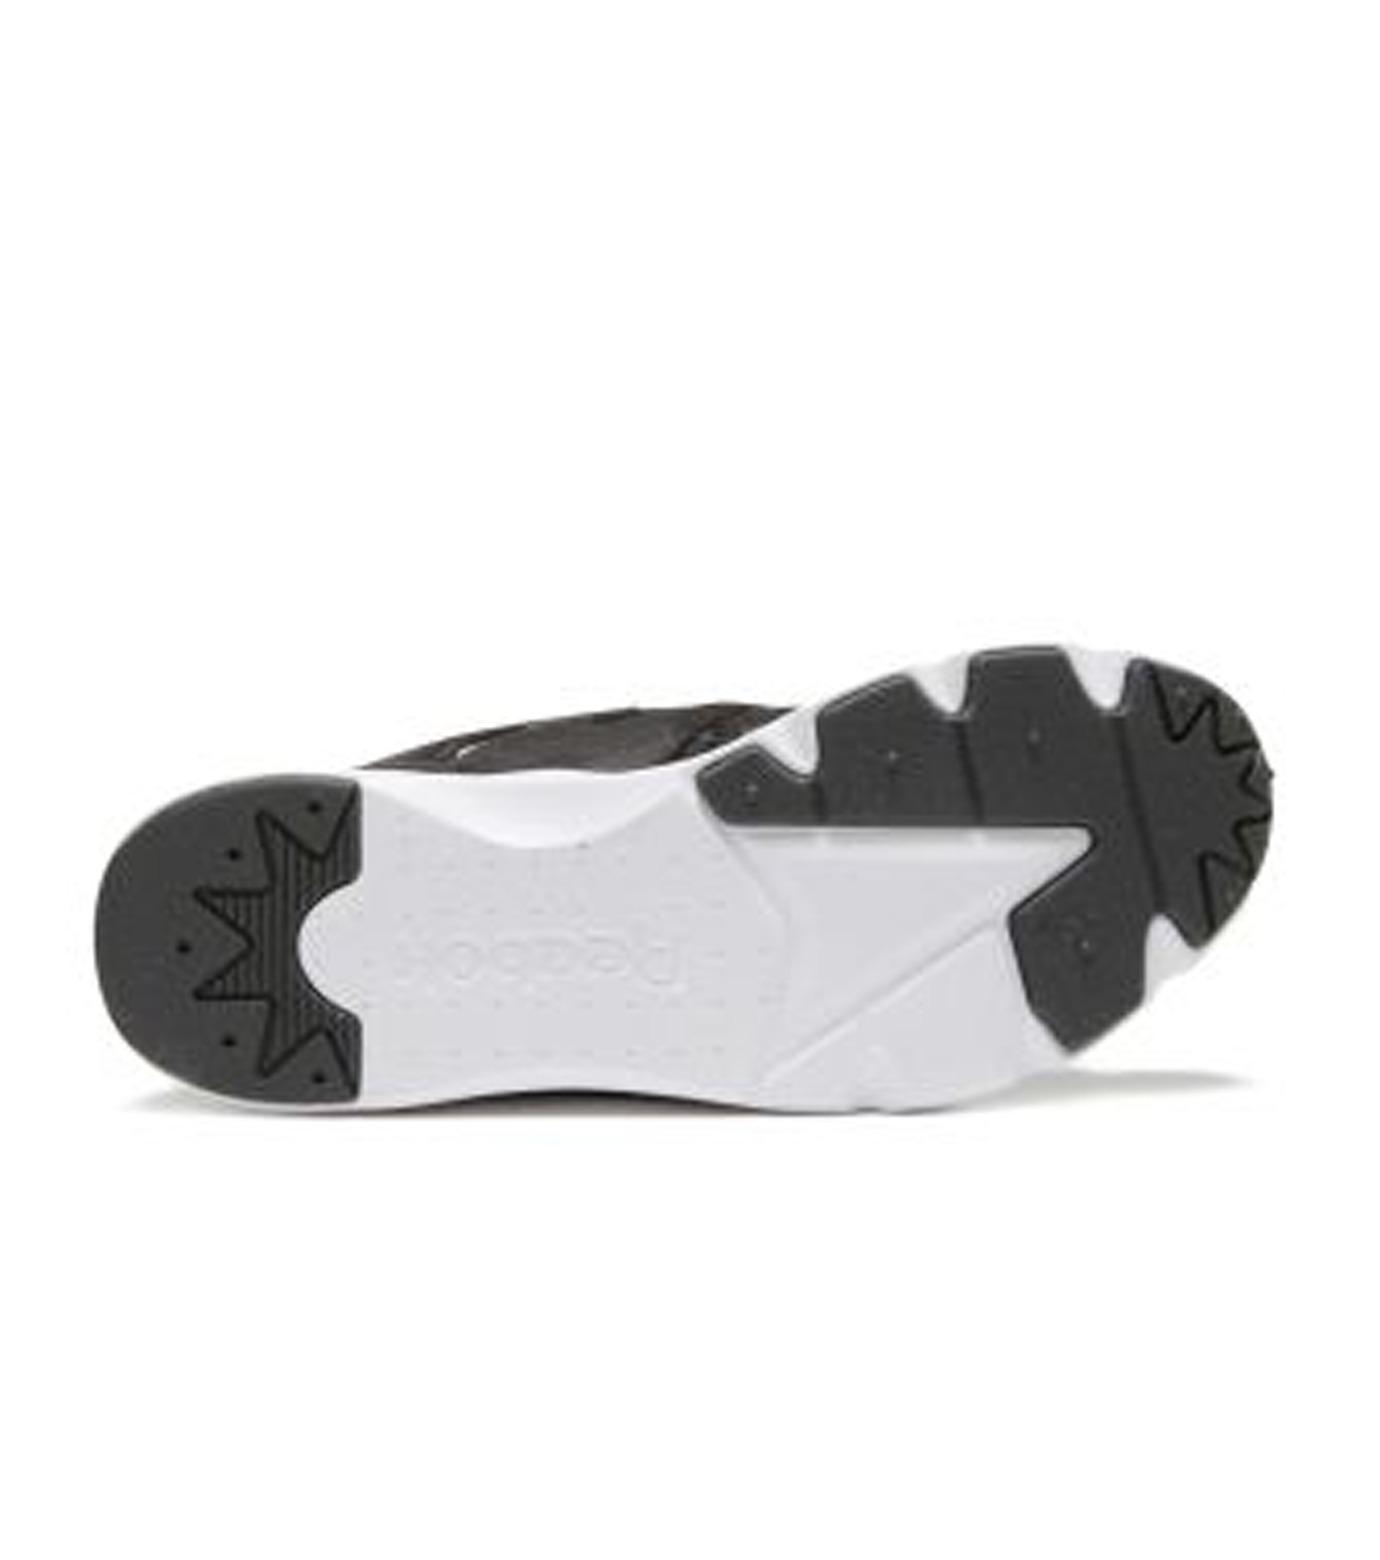 Reebok(リーボック)のFURYLITE NEW WOVEN-BLACK(シューズ/shoes)-V70798-13 拡大詳細画像2